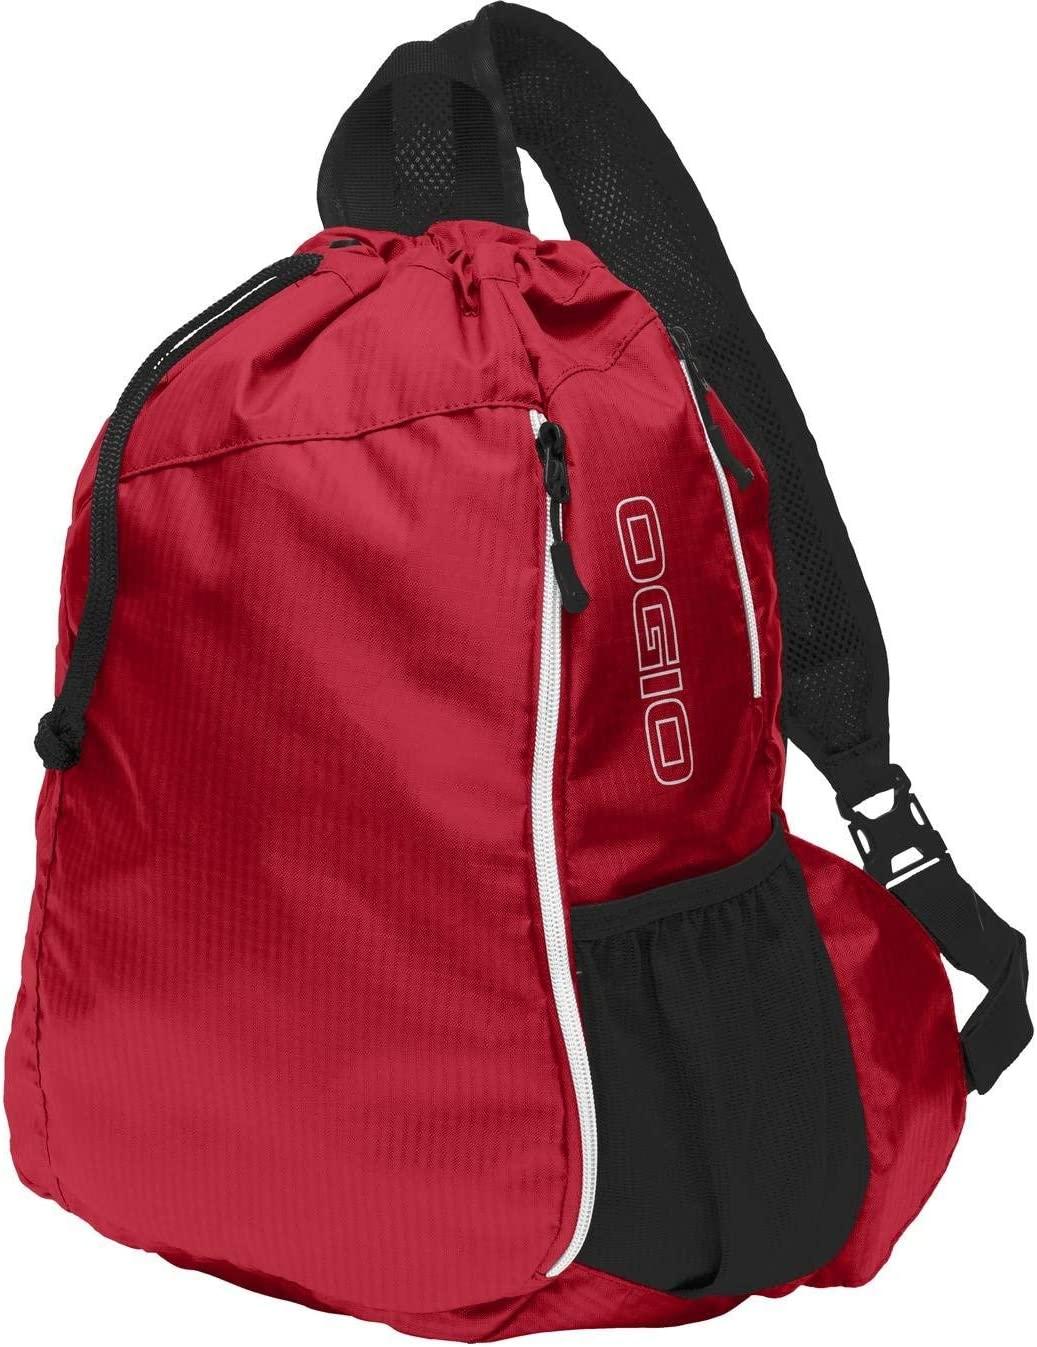 OGIO - Sonic Sling Pack, Deep Red/Black, OS